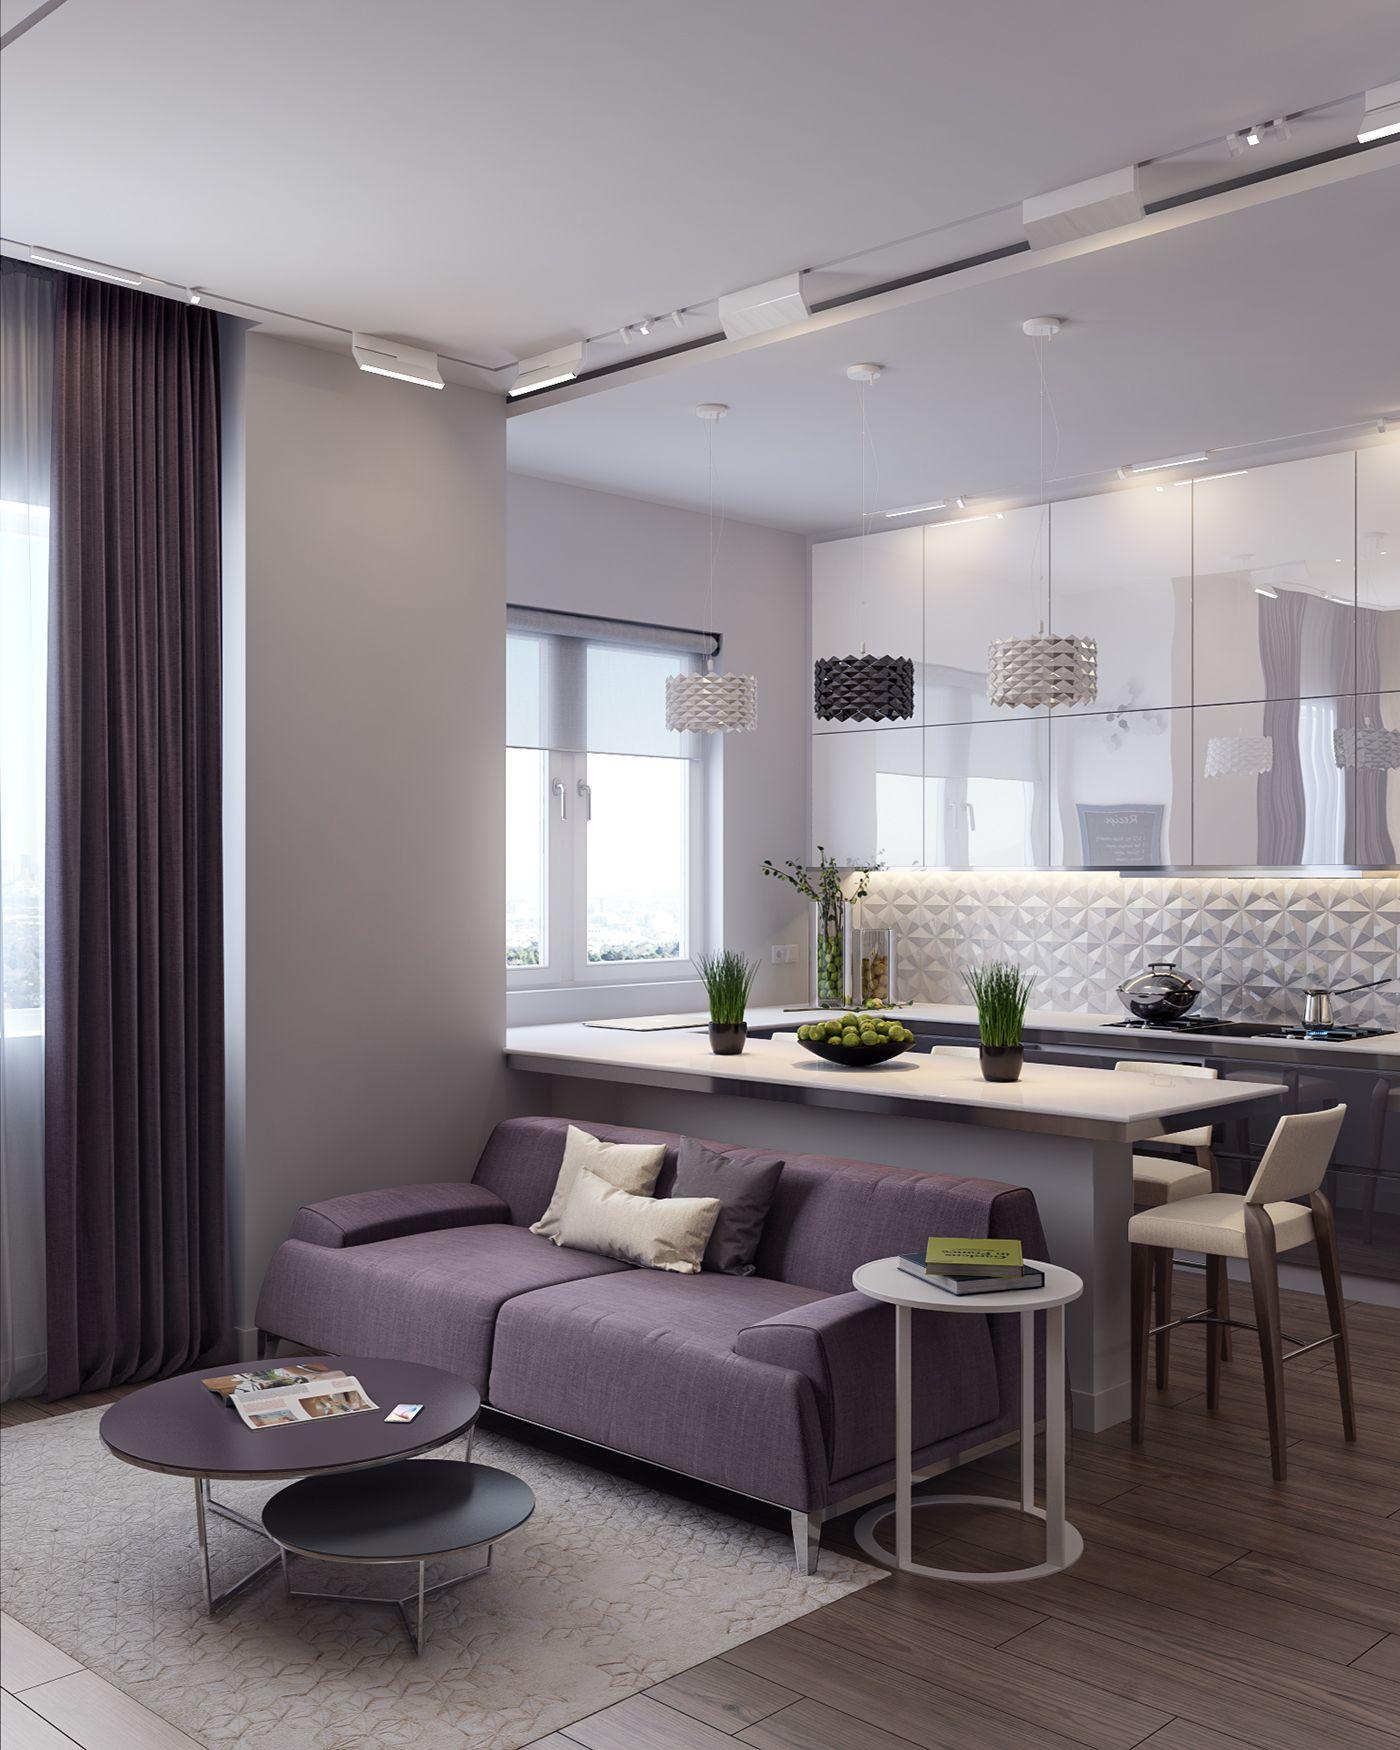 Living Room Condo Design: Hexa Sour On Behance In 2020